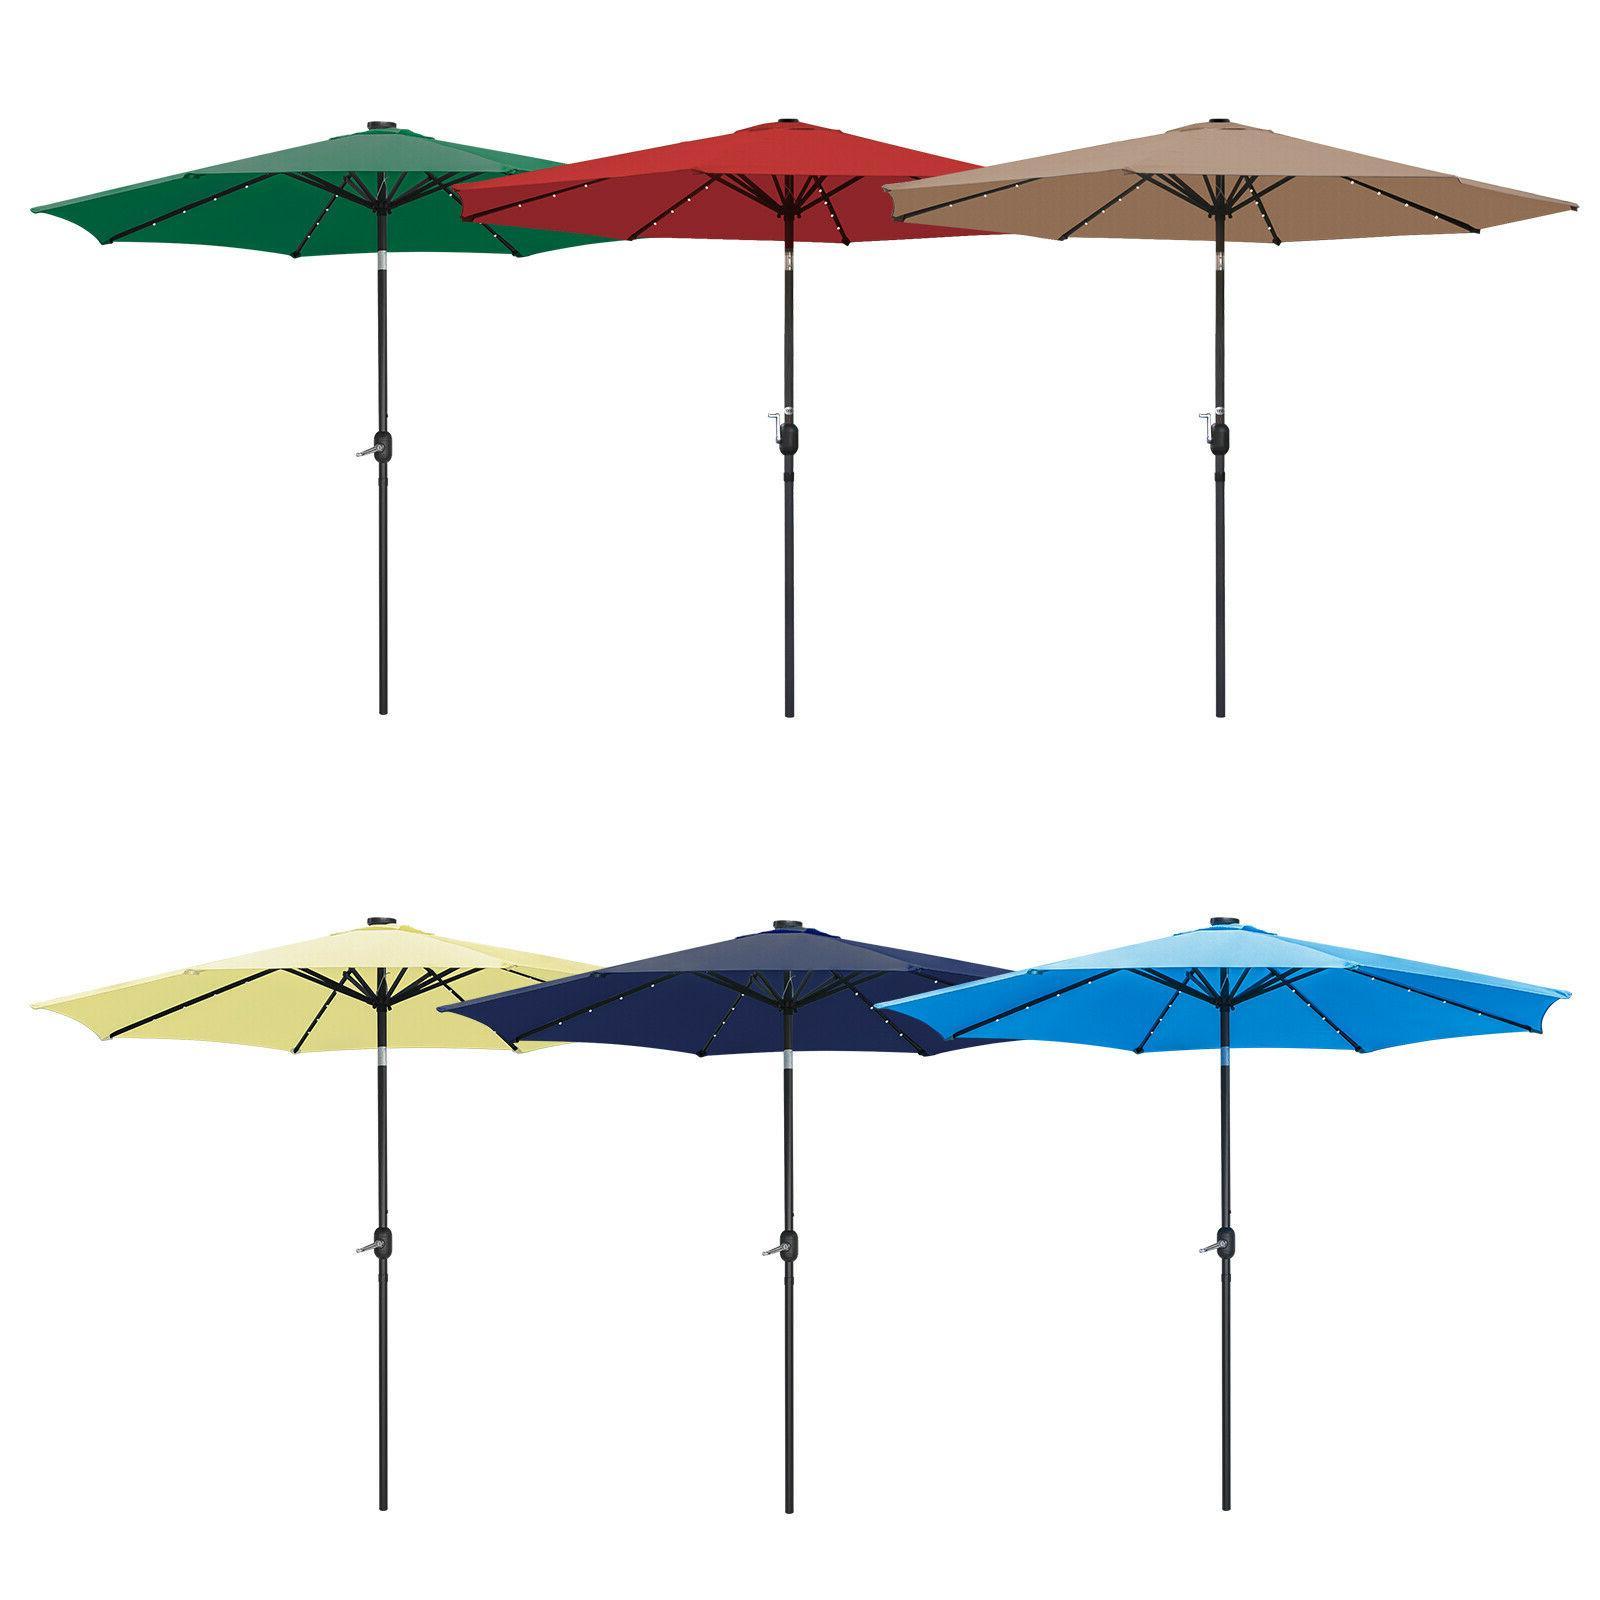 10ft patio solar umbrella led patio market